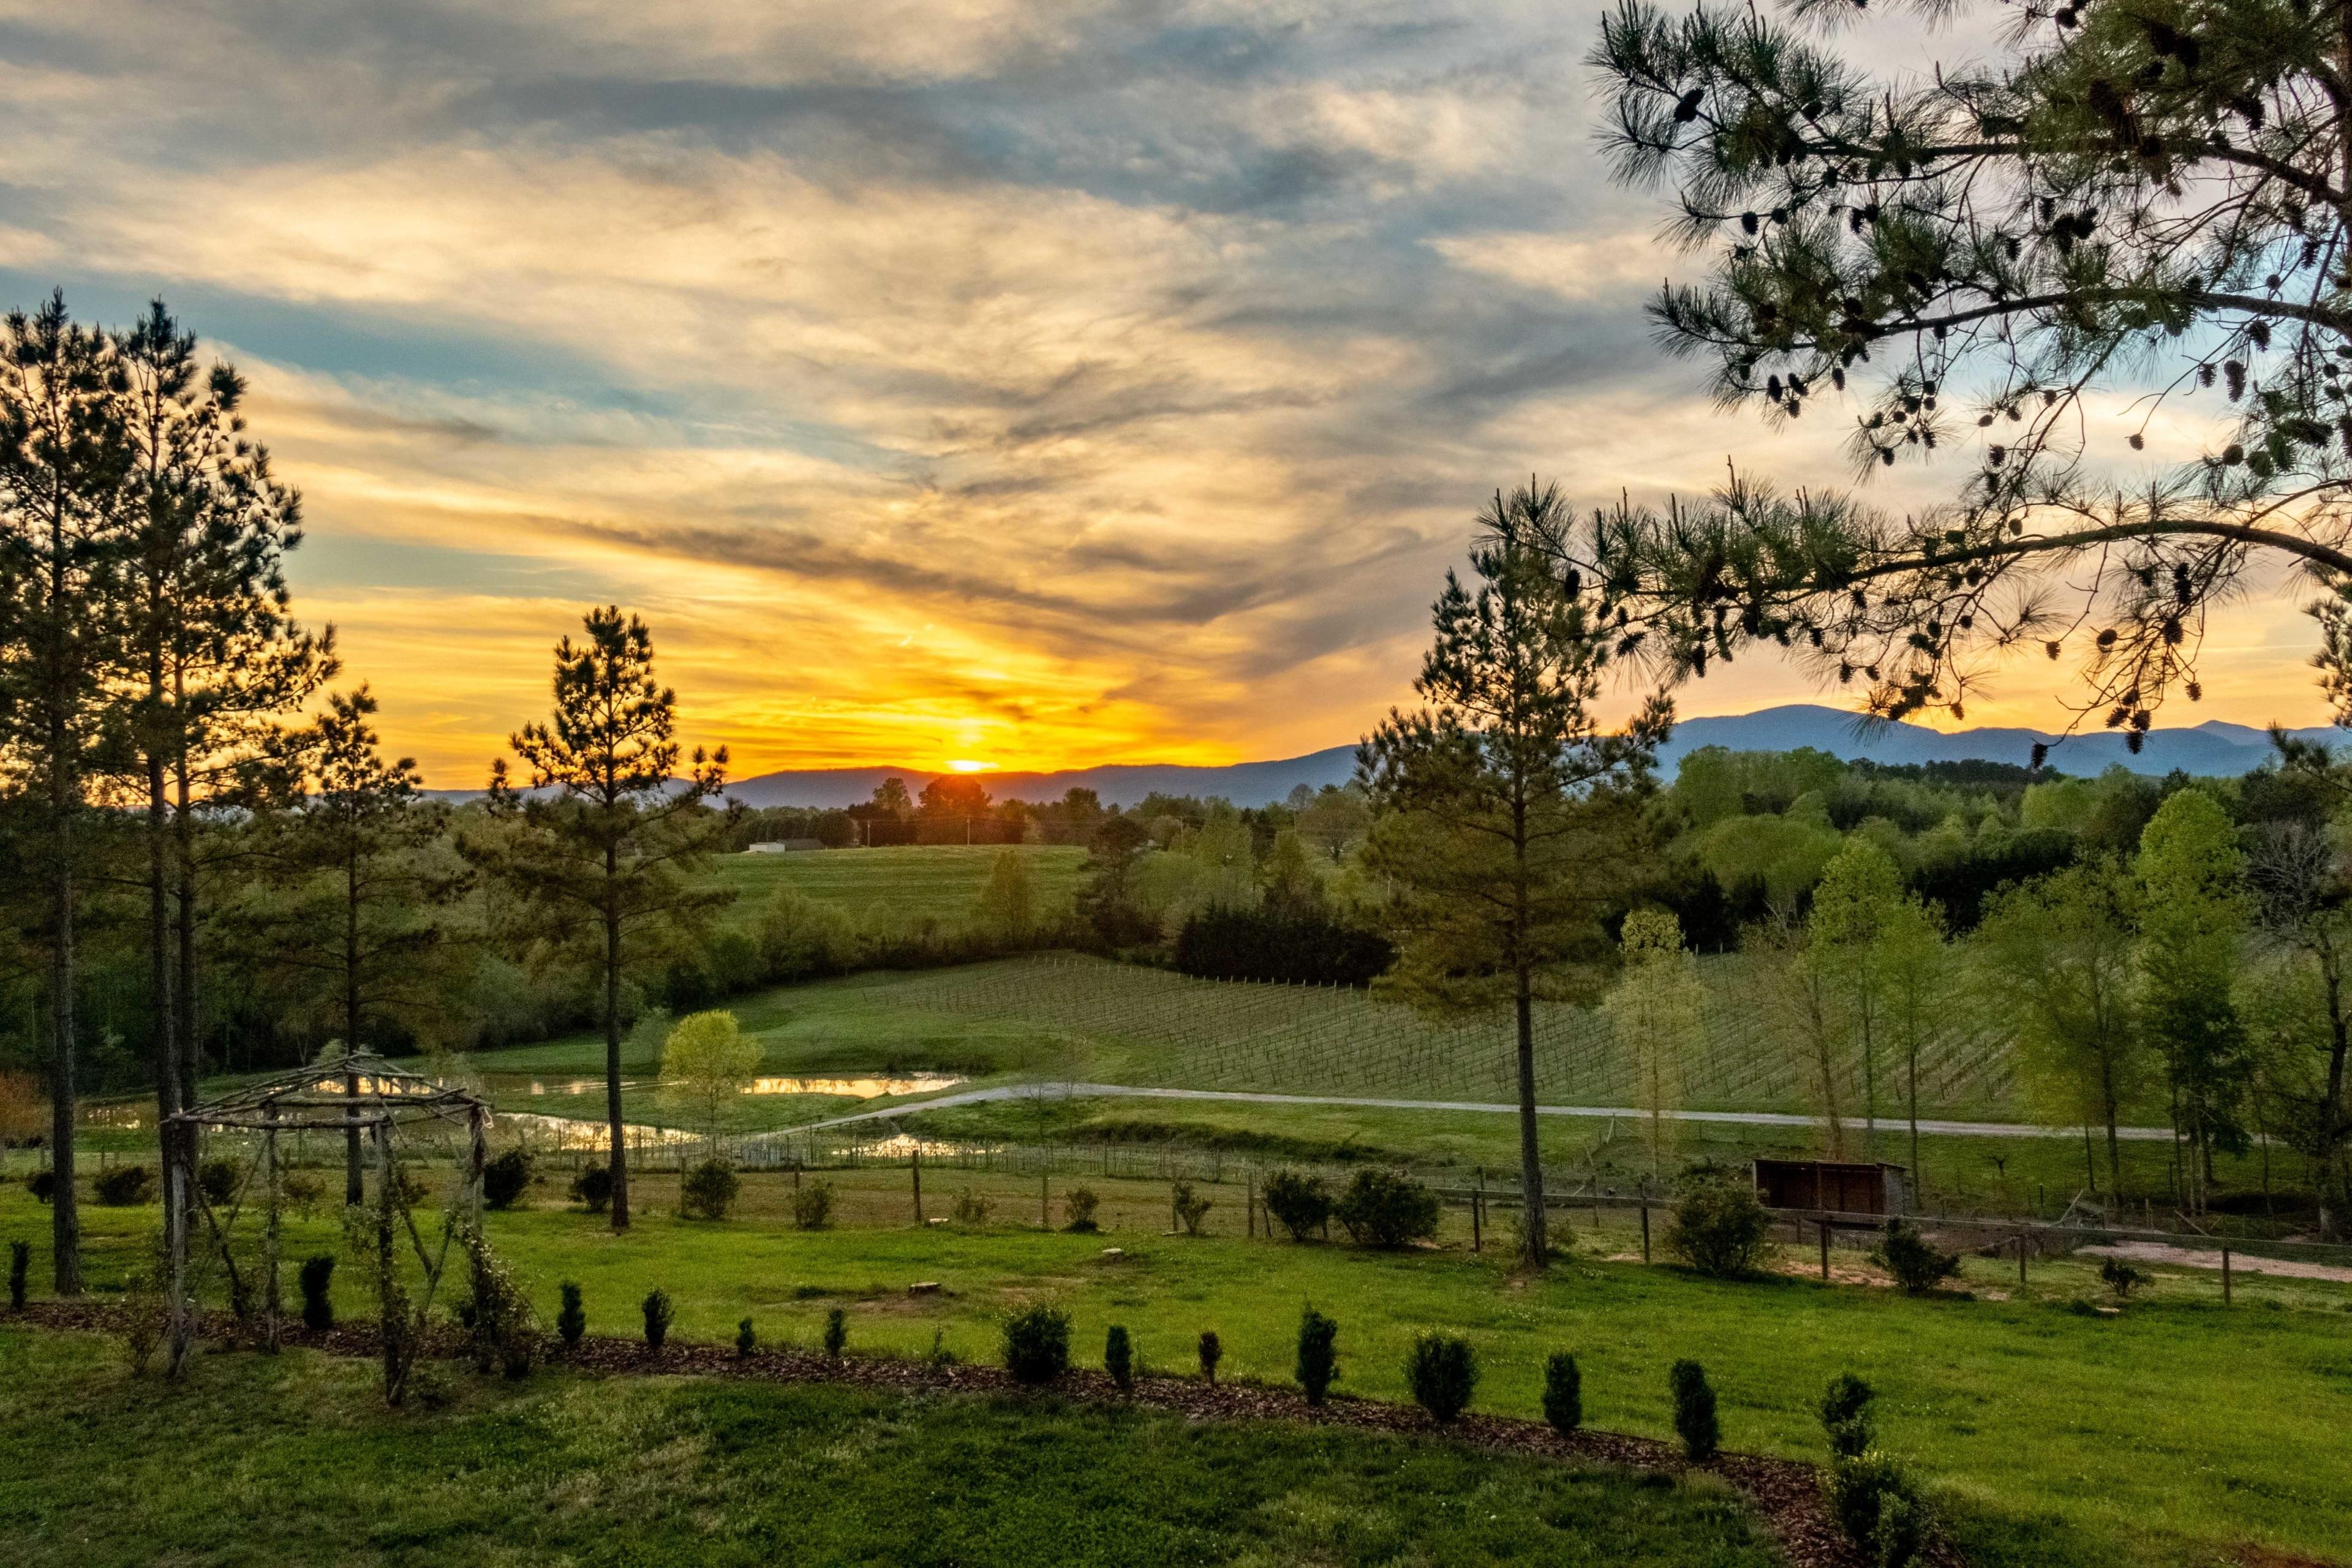 Mill Spring, North Carolina, United States of America